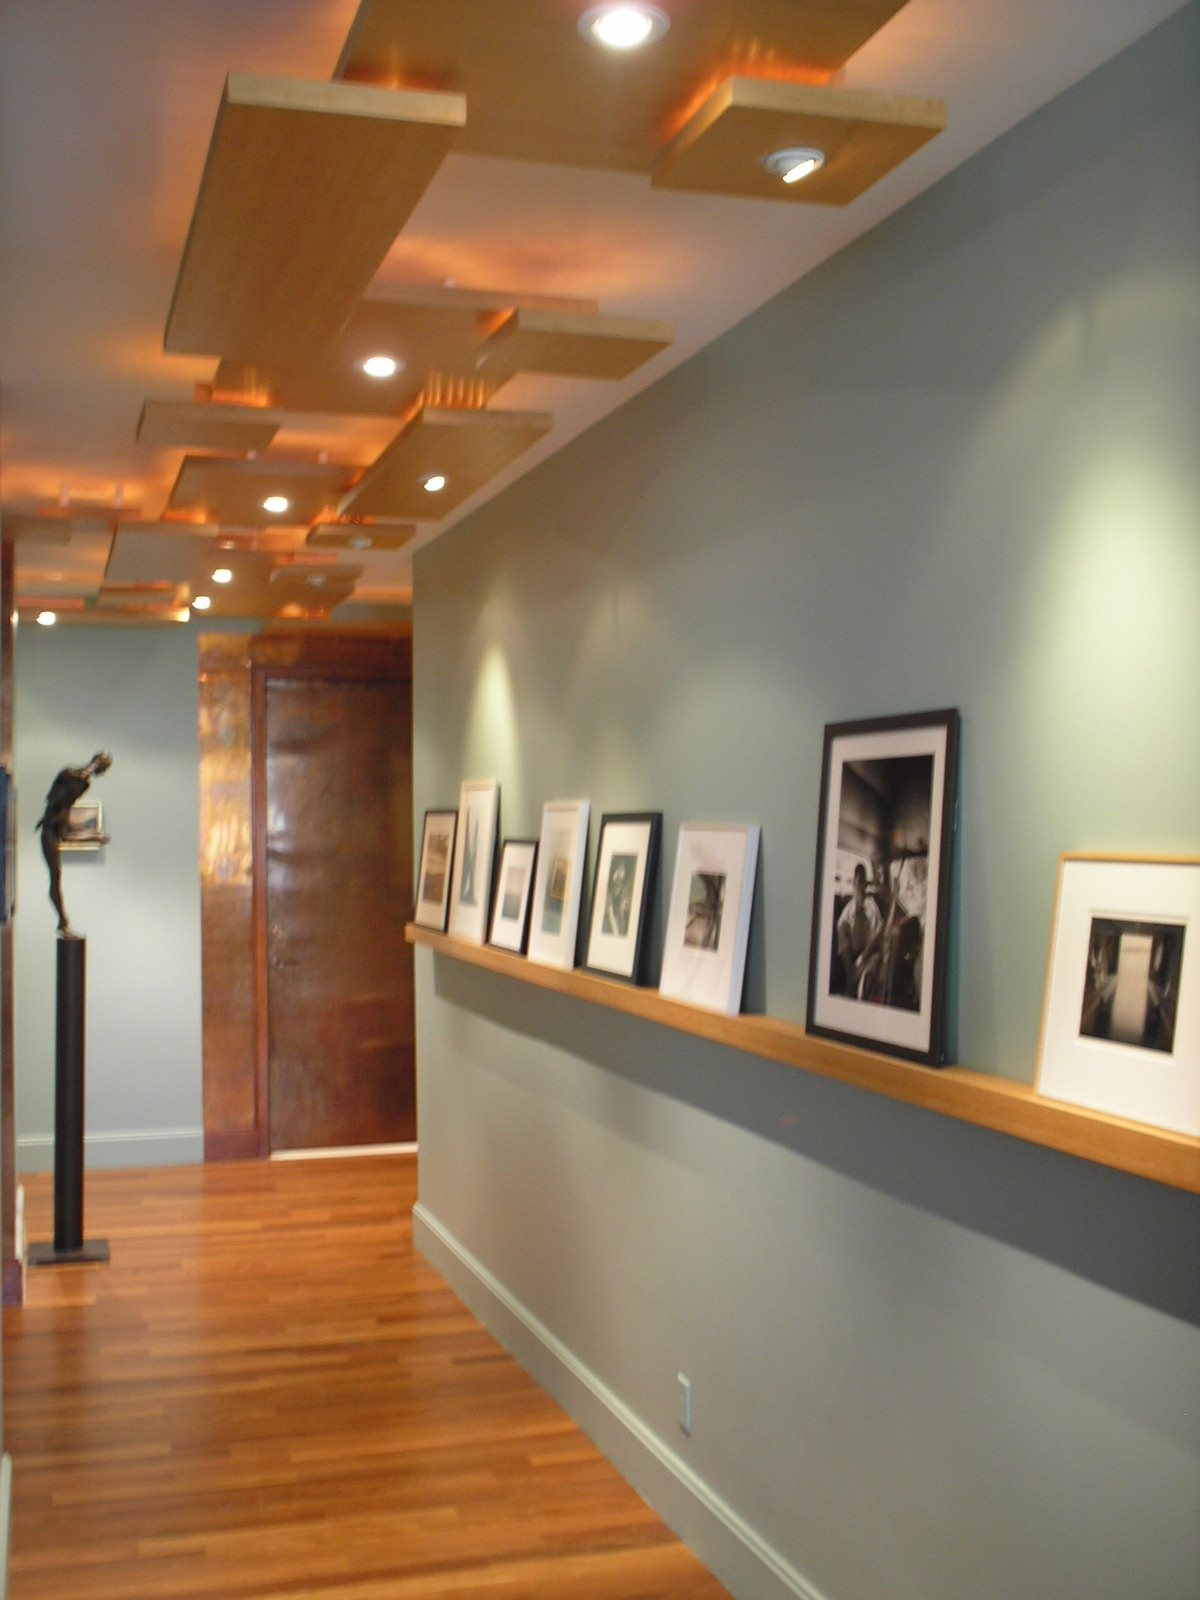 Fall Ceiling Designs For Hall | Joy Studio Design Gallery ...